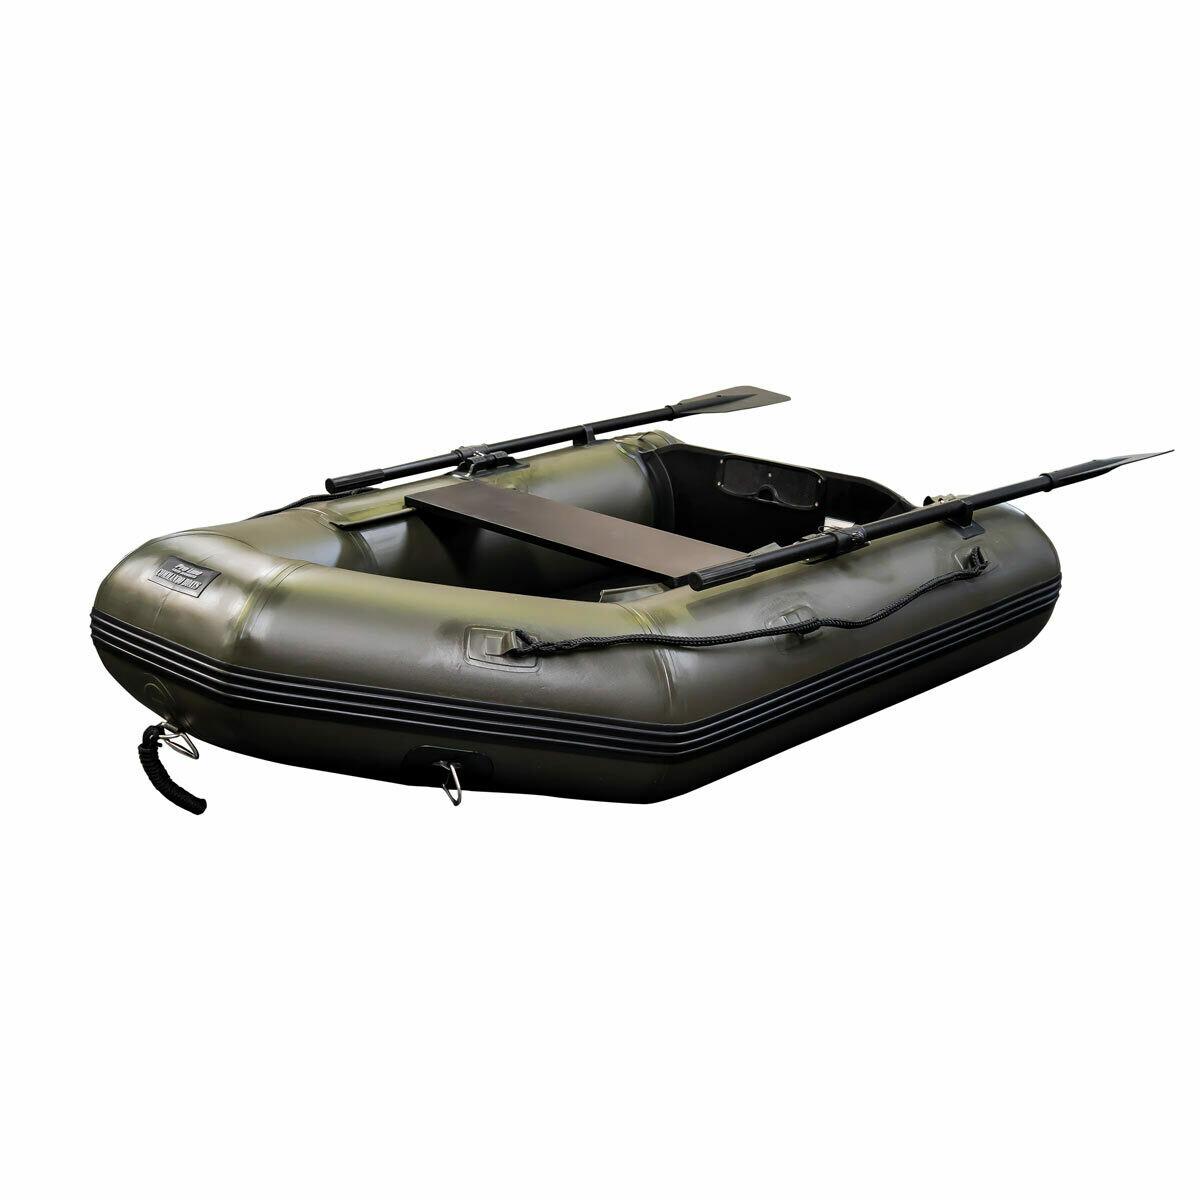 Pro line carp boat 180 AD Lightweight